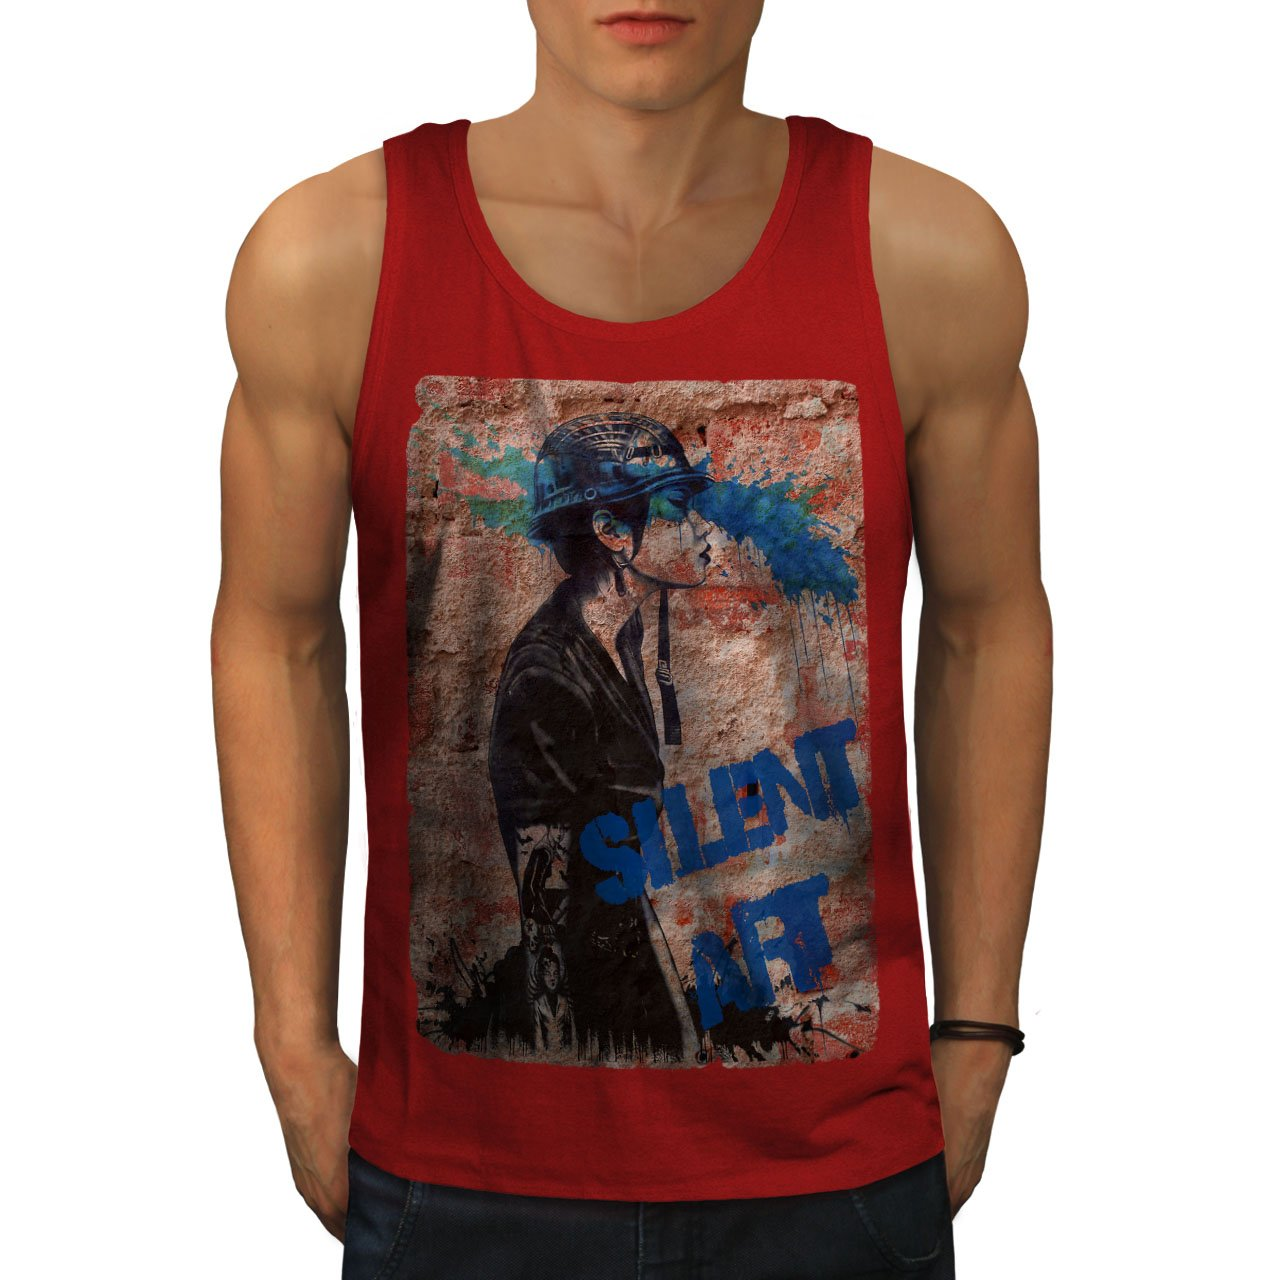 Wellcoda Silent Art Trendy Mens Tank Top, Punk Fit Lifestyle Sports Shirt